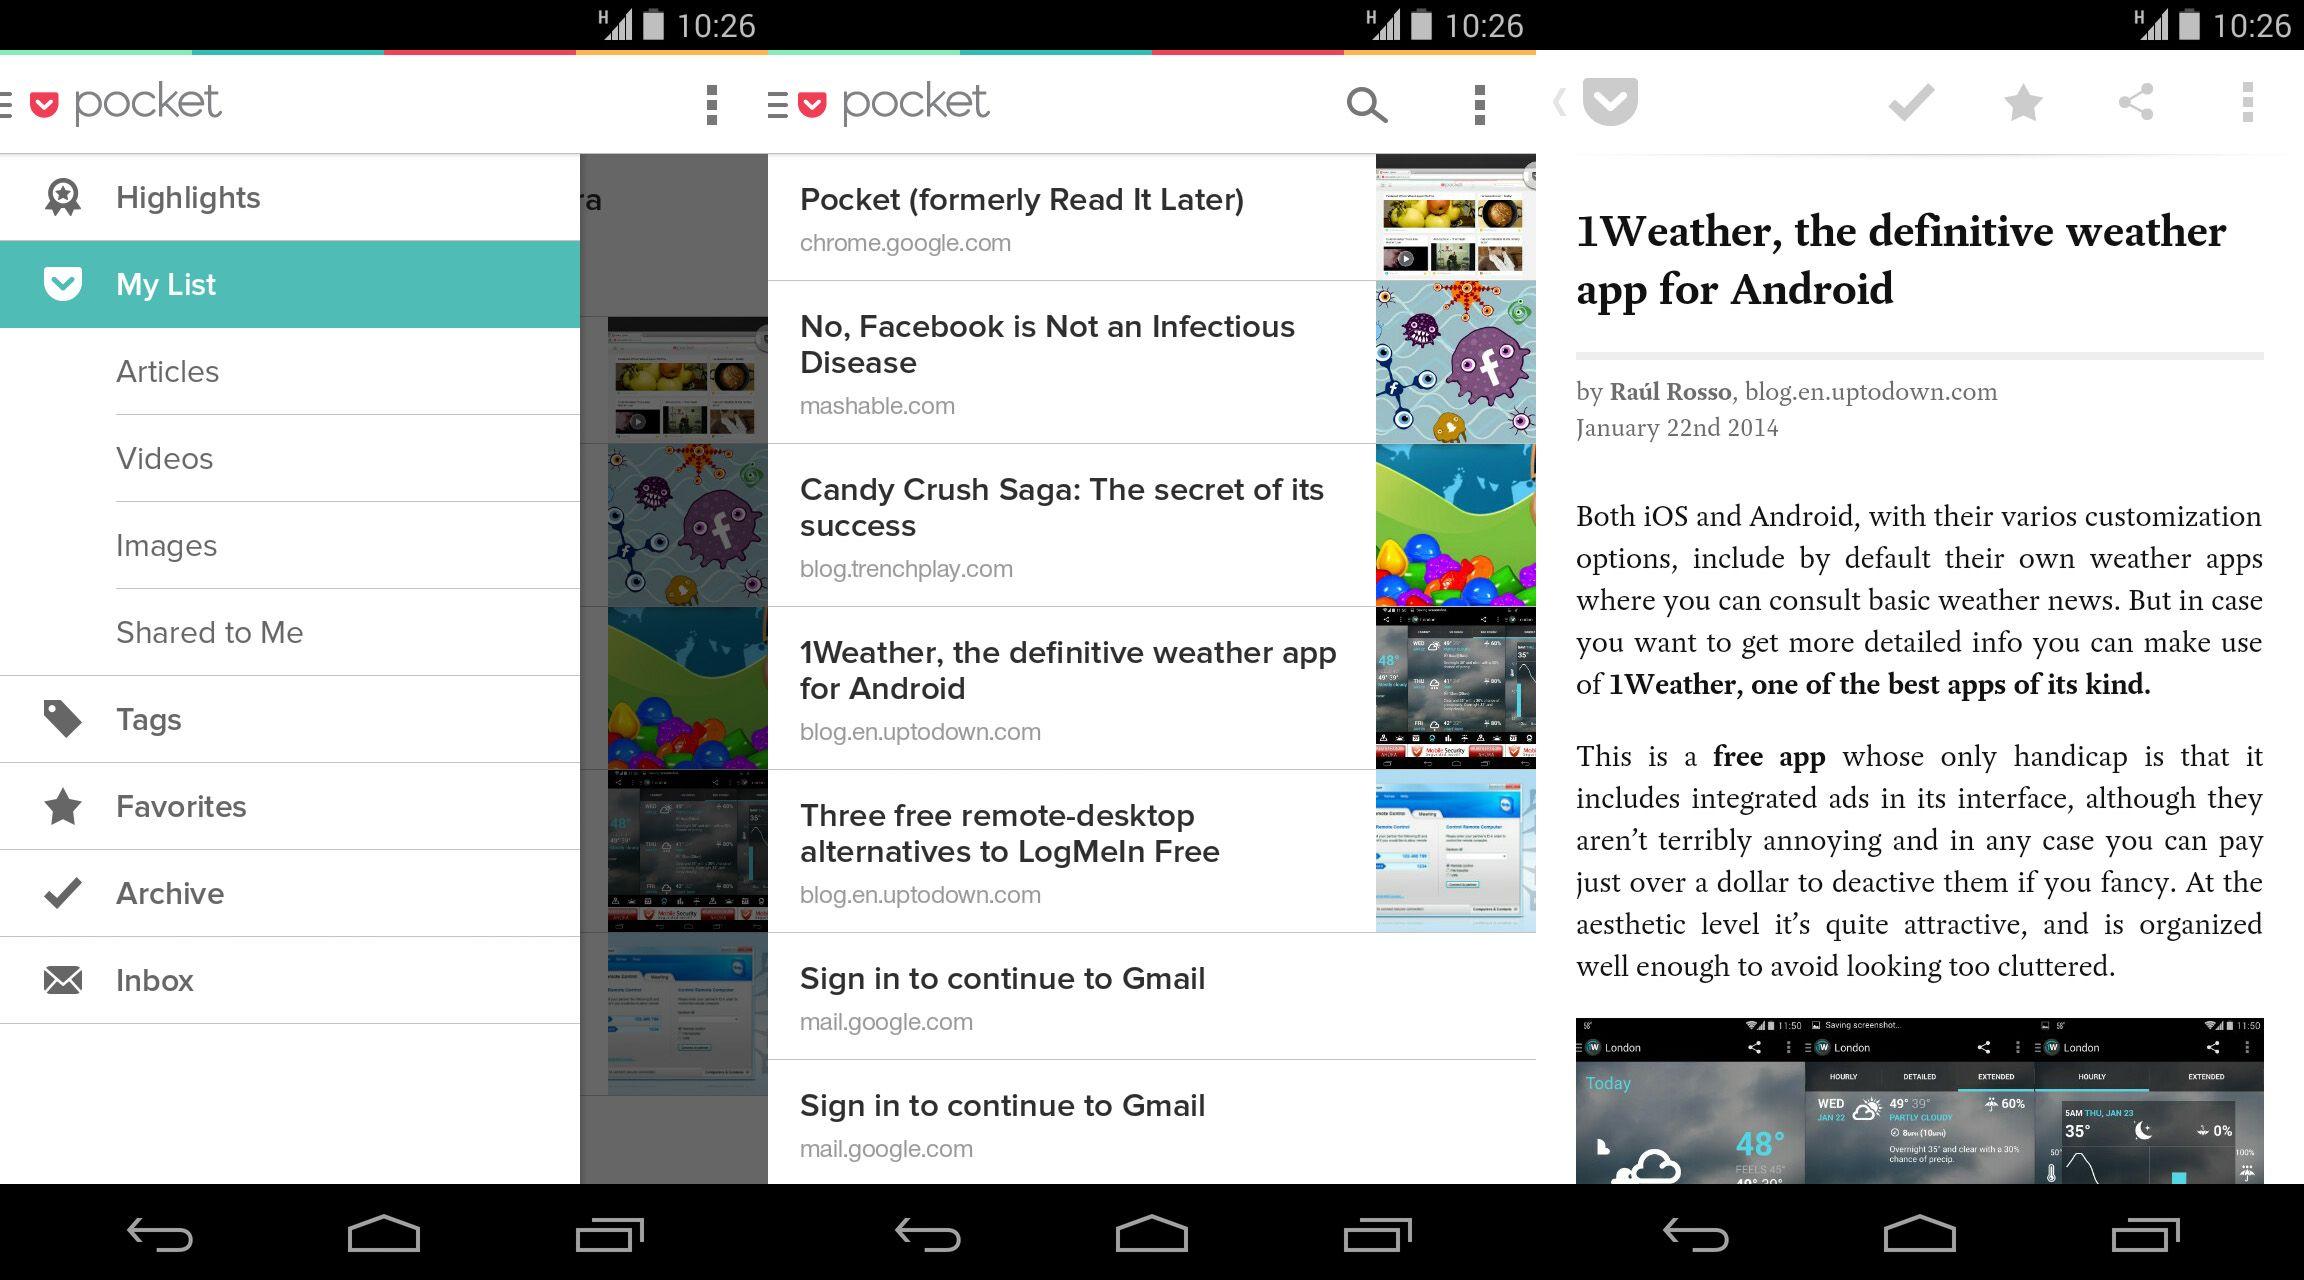 Pocket-screenshot-2